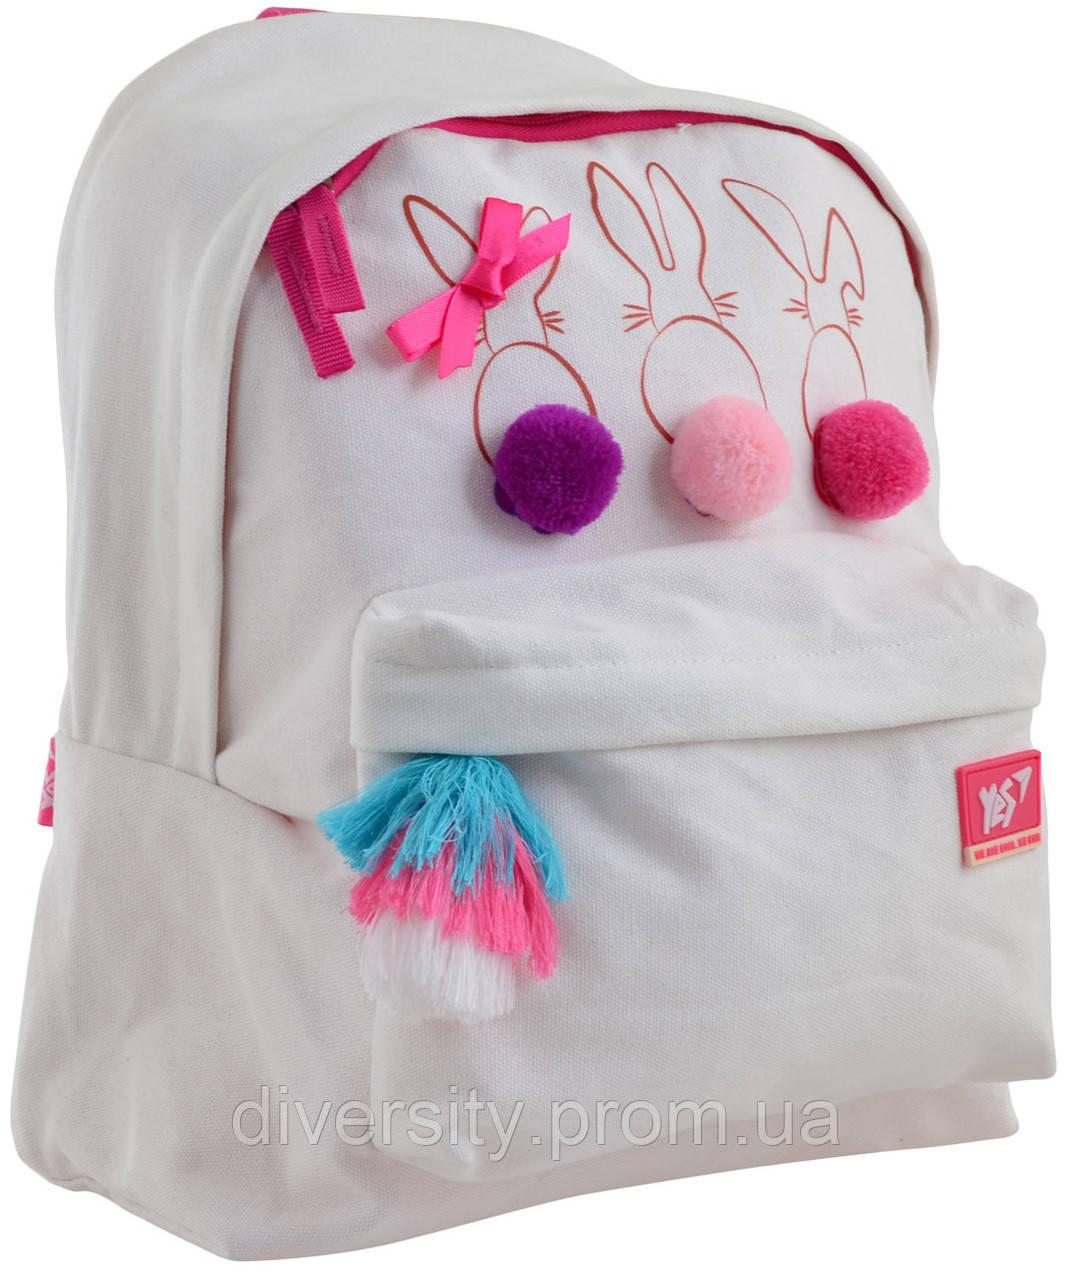 "Молодежный рюкзак YES  ST-30 ""Funny Bunnies"""